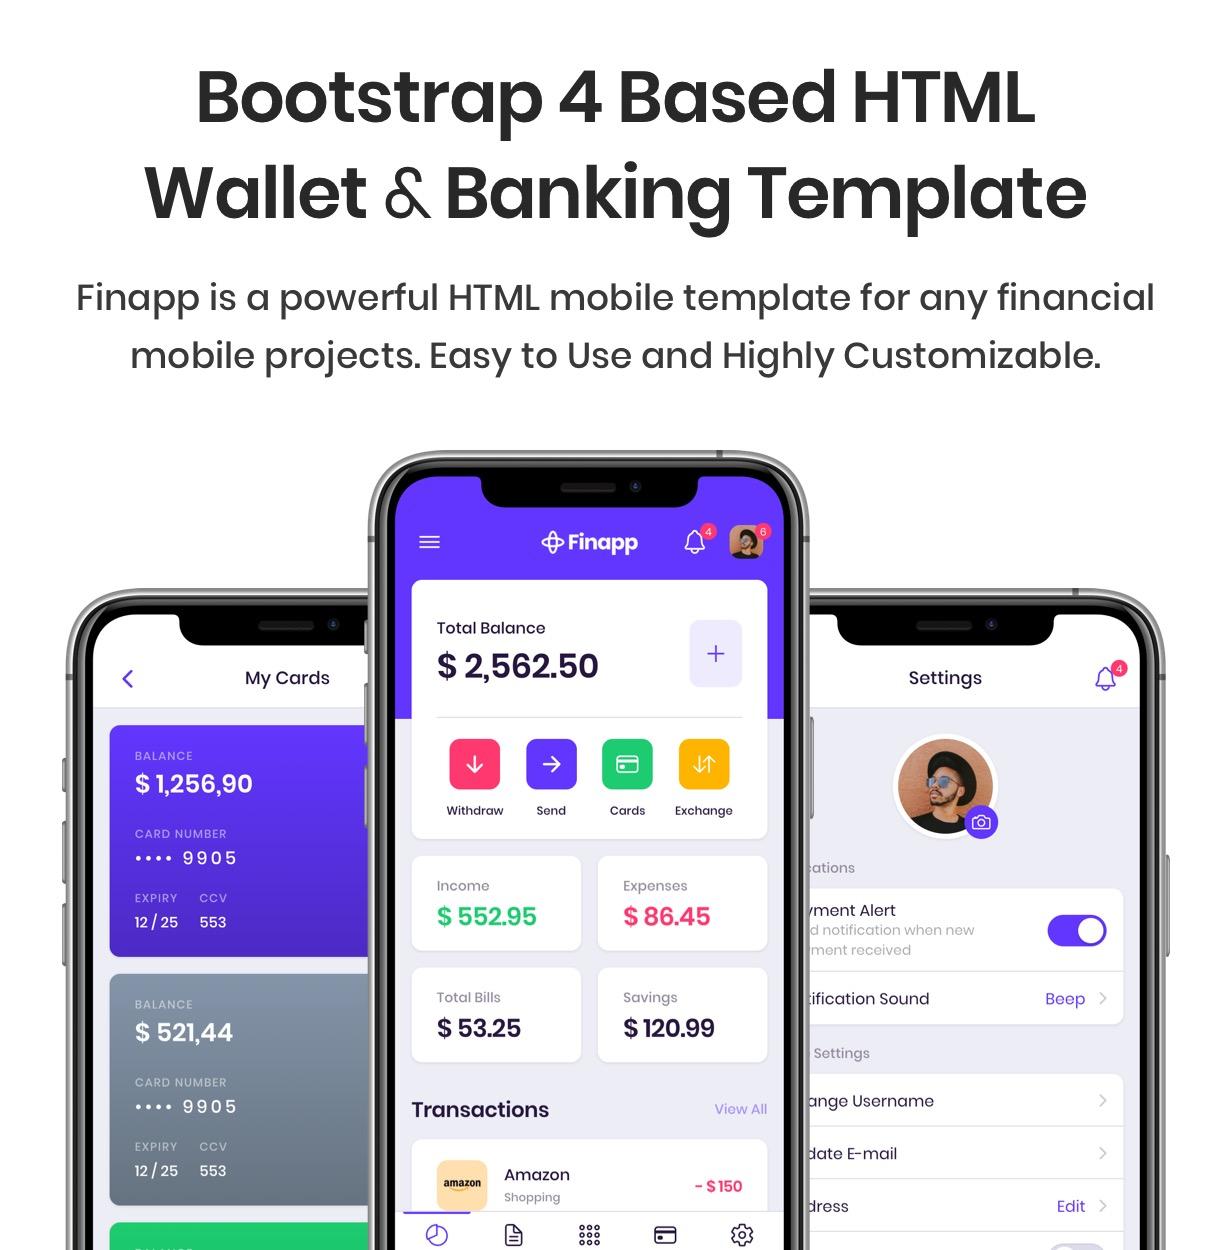 wallet template